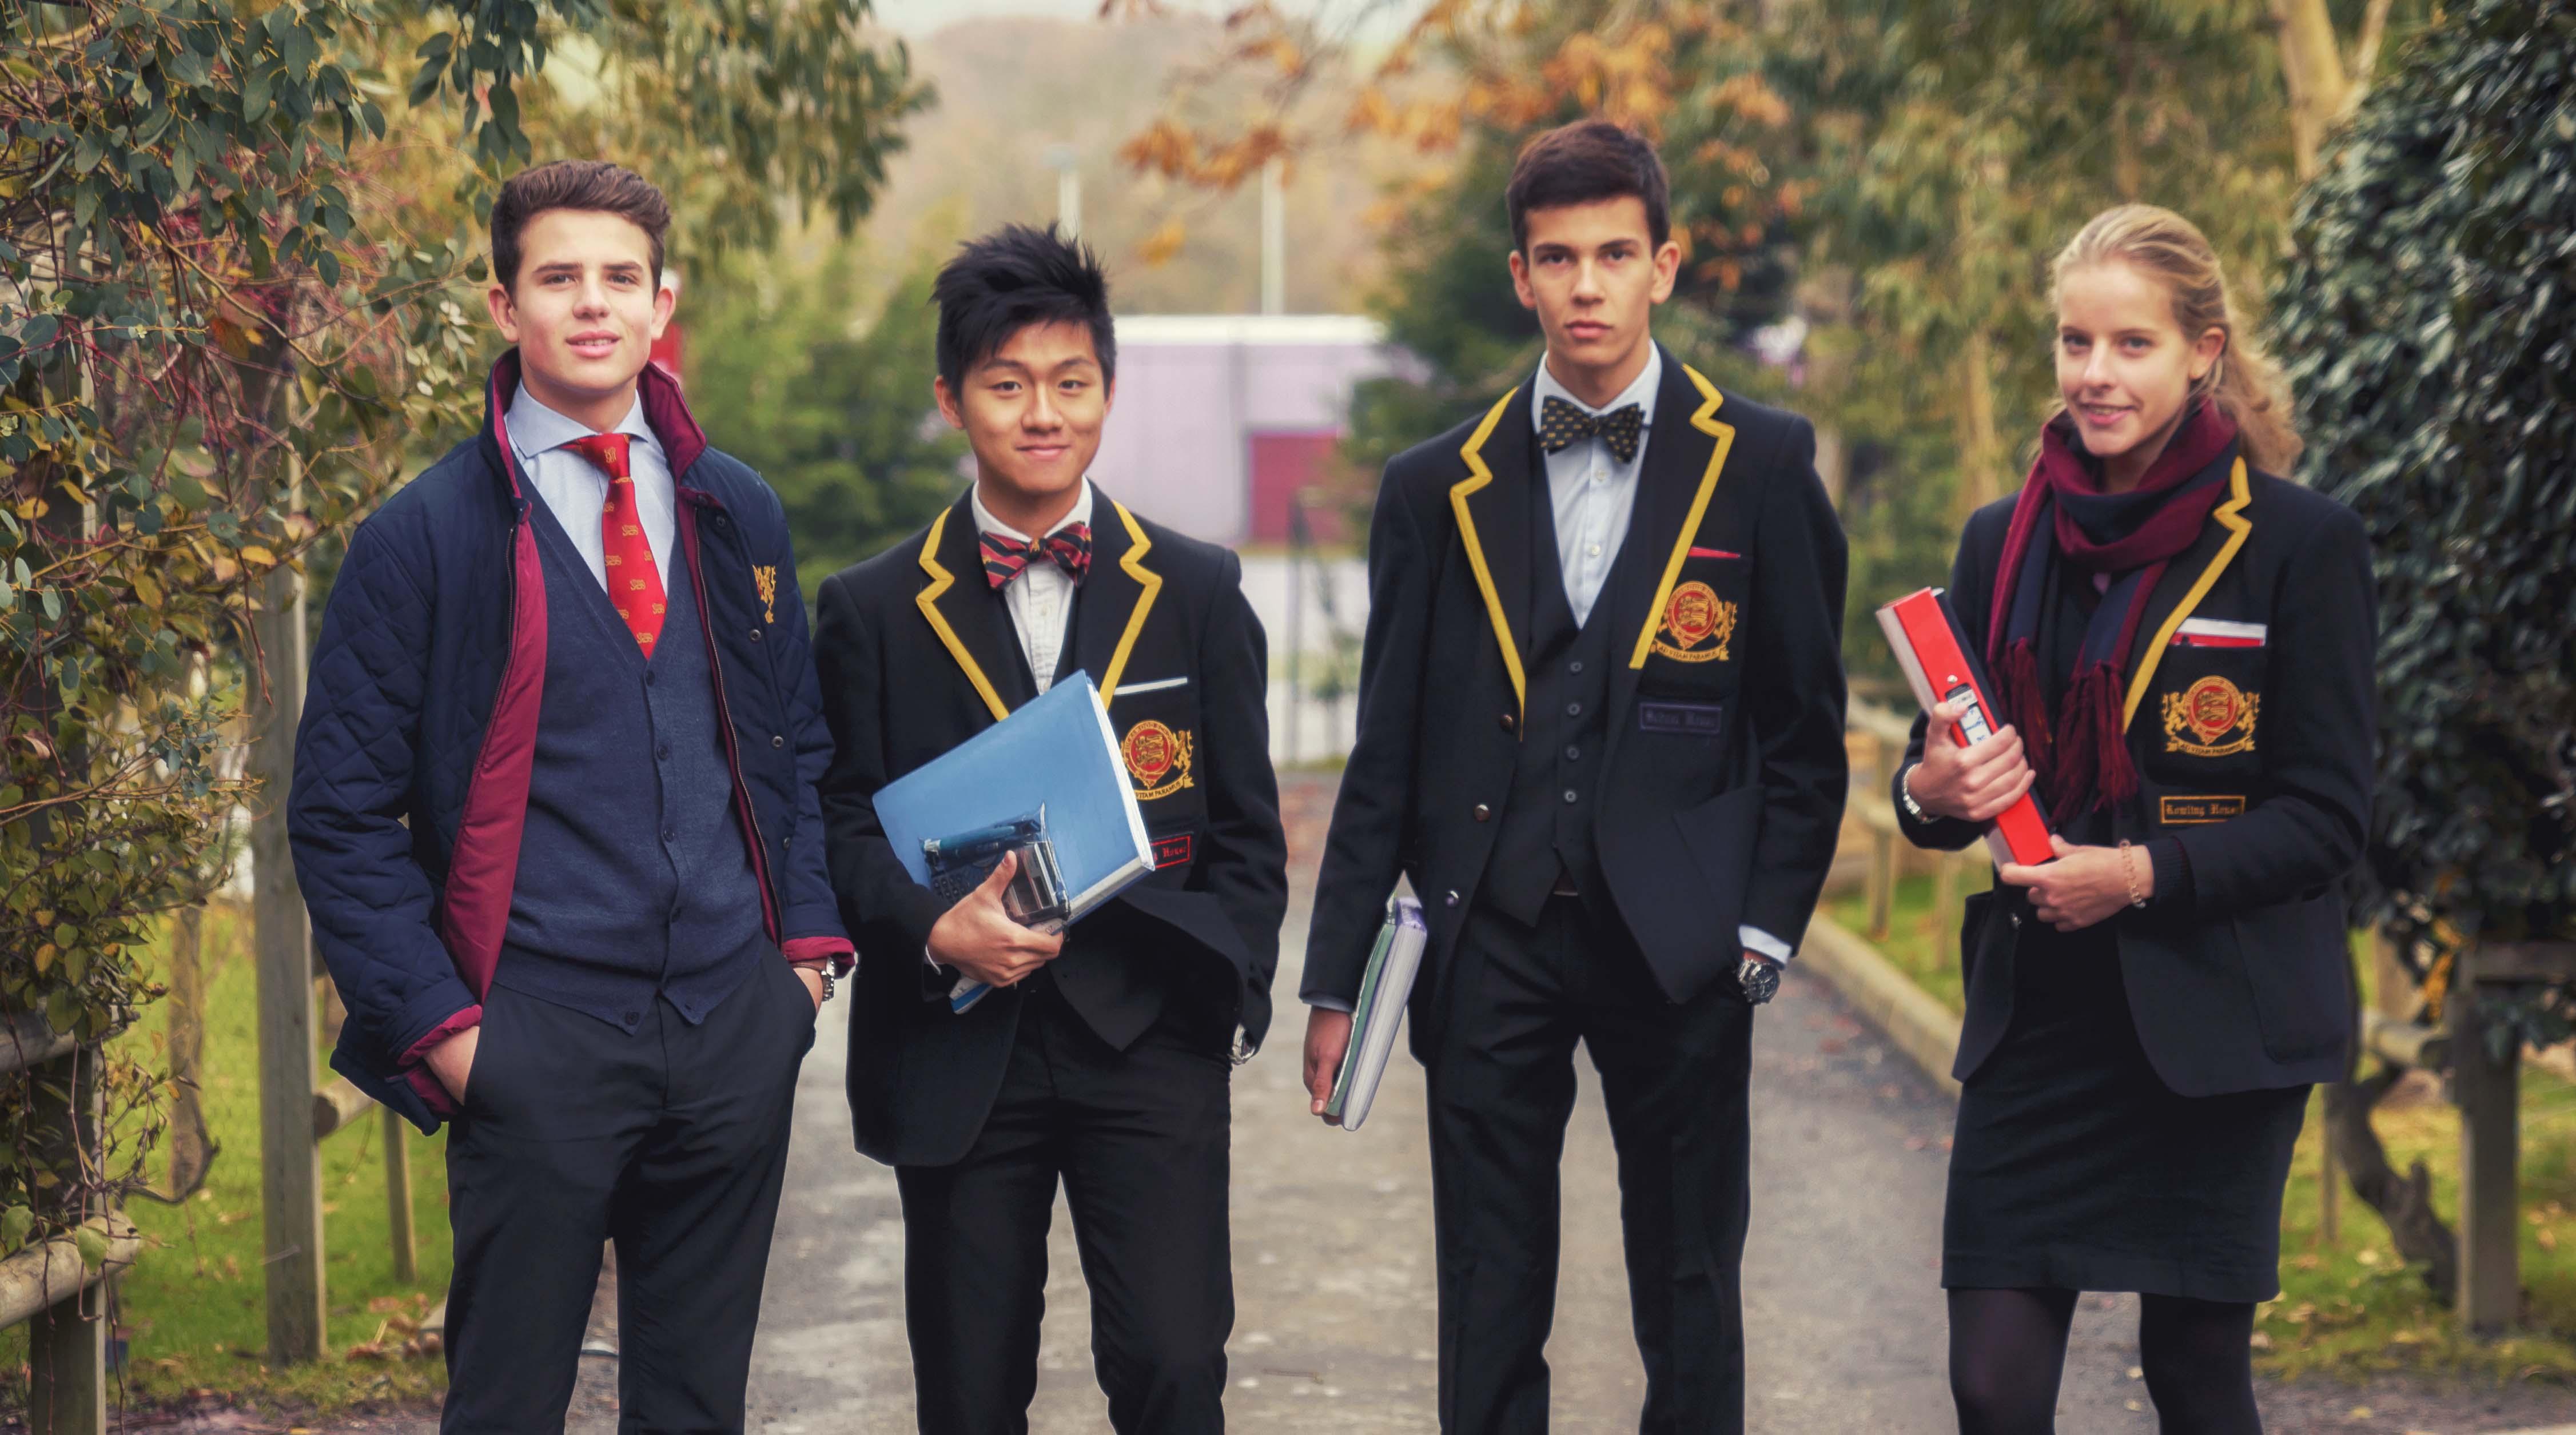 Buckswood School|イギリス高校留学